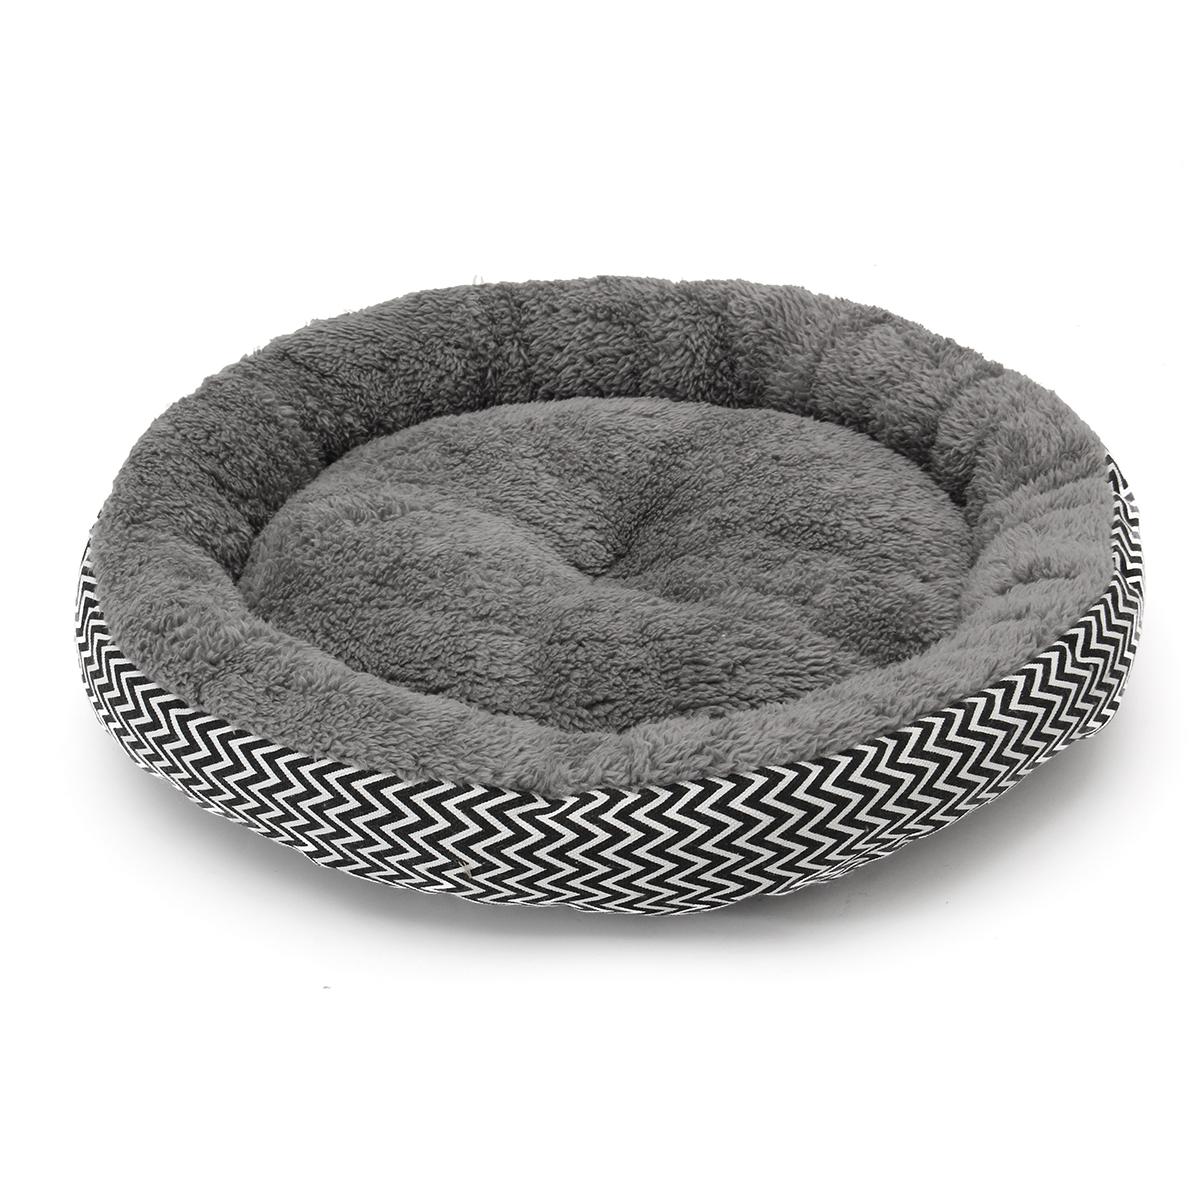 Pet Dog Puppy Cat Kitten Warm Pad House Nest Mat Pad Basket Sleeping Cushion